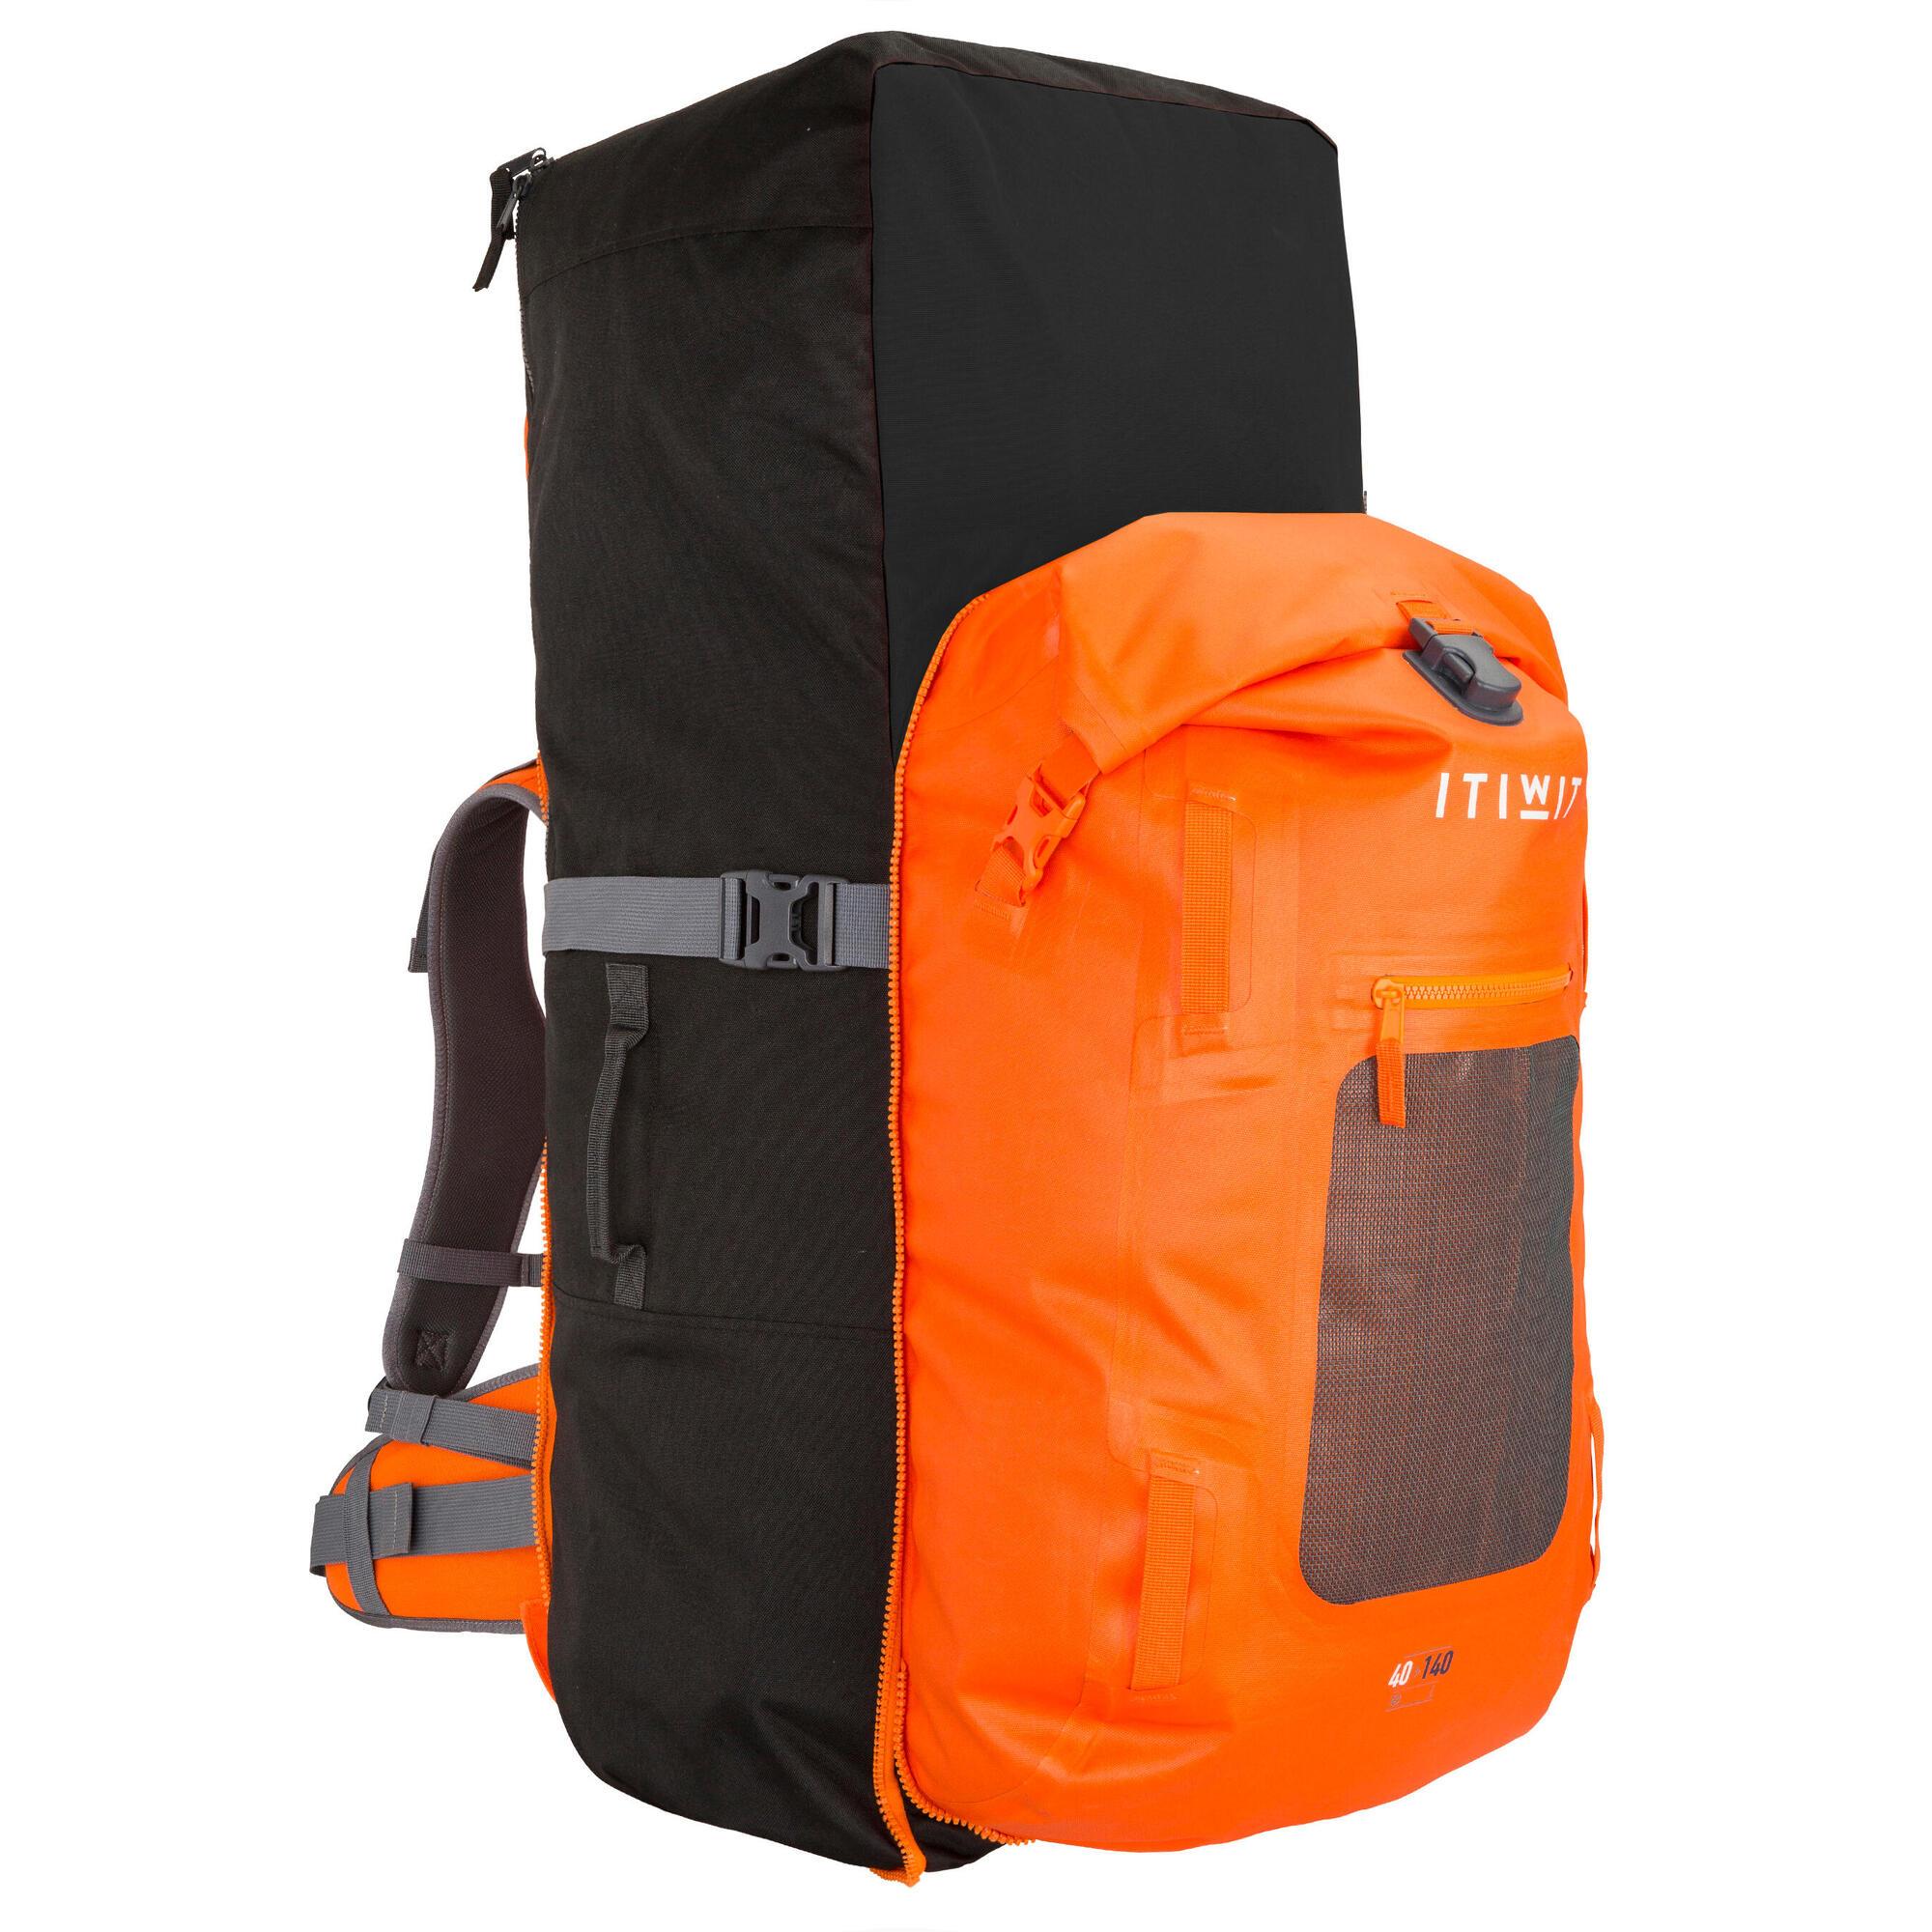 sac a dos stand up paddle randonnee 500 convertible 100 40l etanche orange itiwit. Black Bedroom Furniture Sets. Home Design Ideas